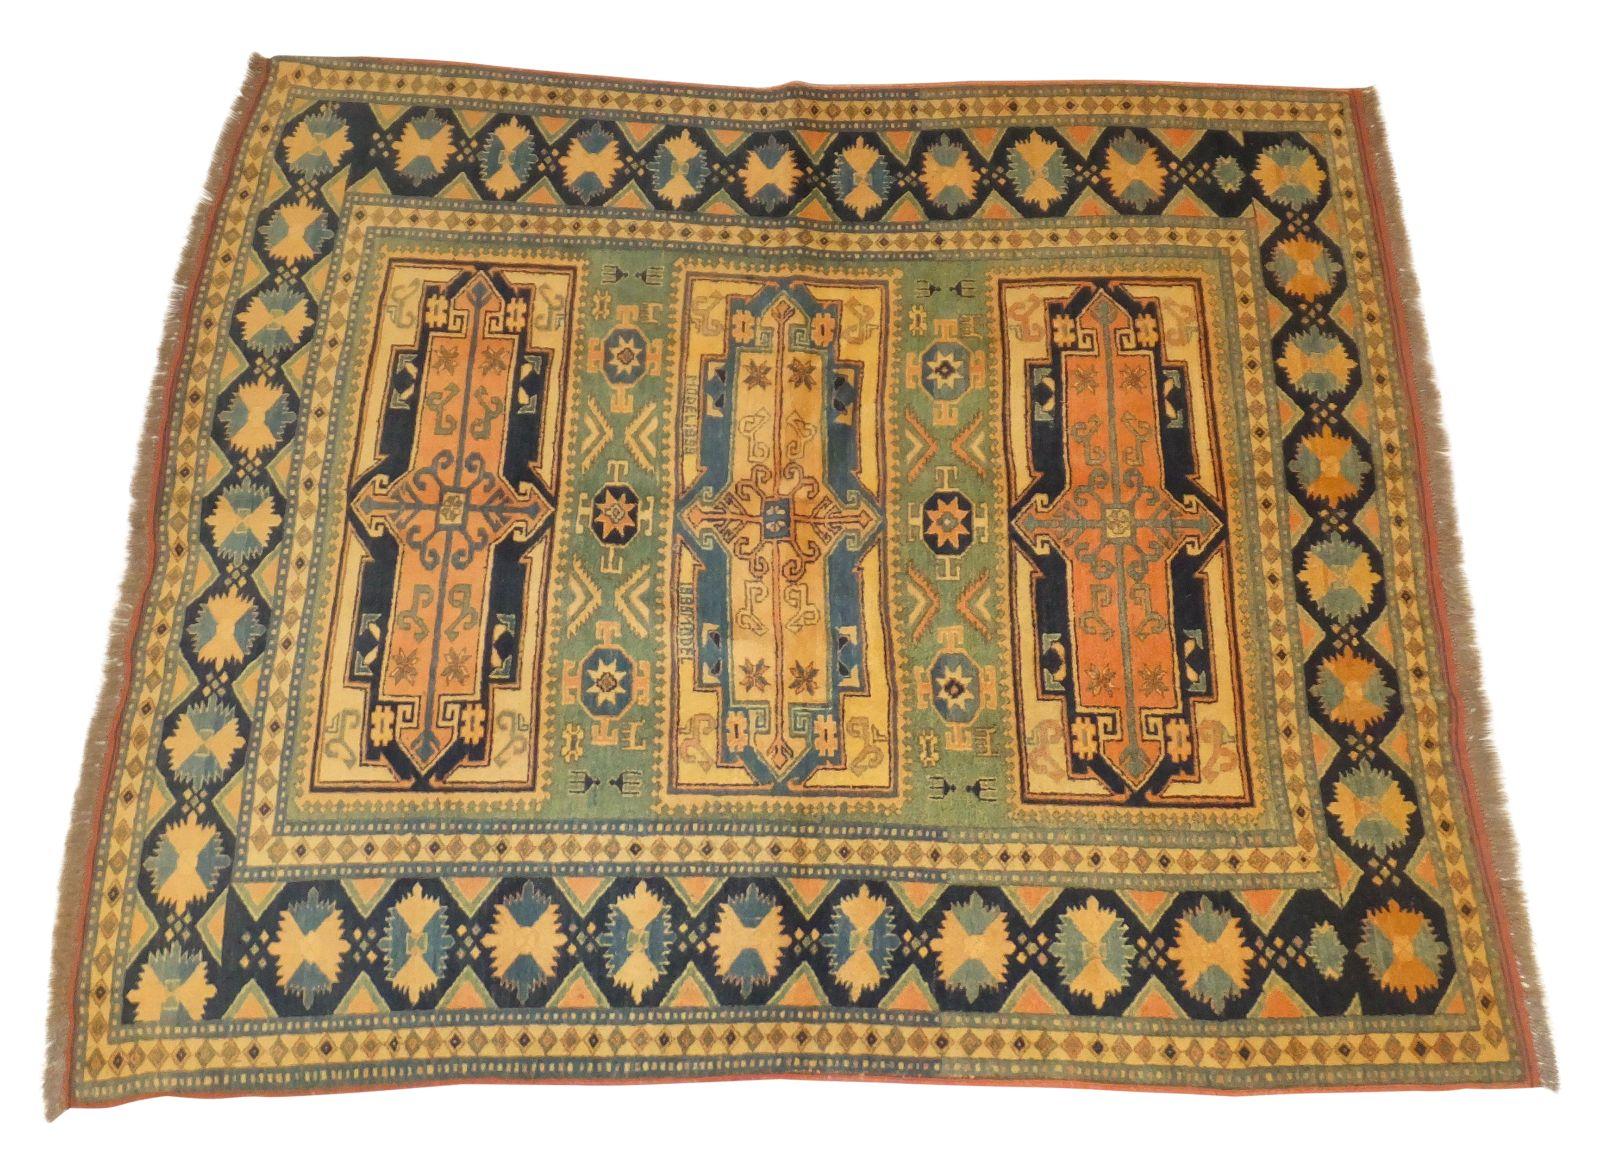 blue gold kazak rug 6 39 x 7 39 chairish. Black Bedroom Furniture Sets. Home Design Ideas